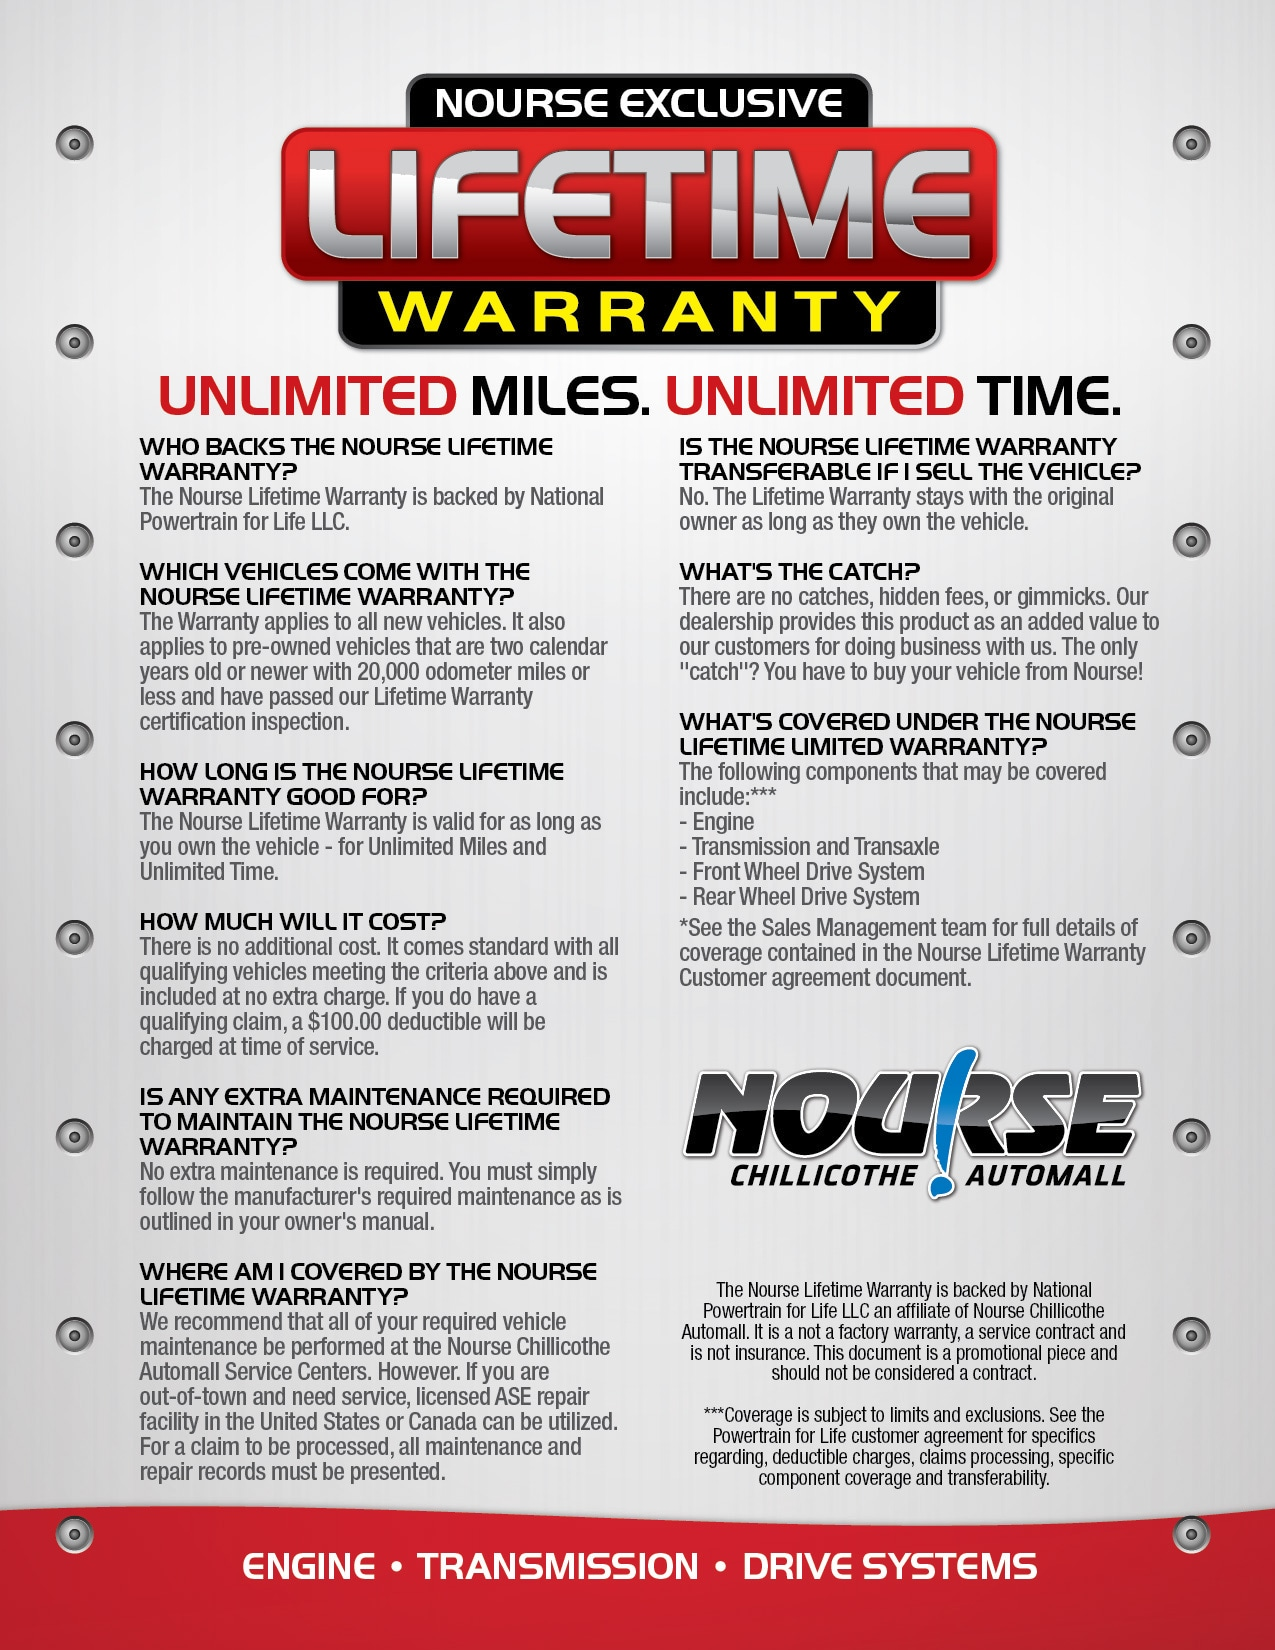 Nourse Lifetime Warranty Unlimited Miles Unlimited Time